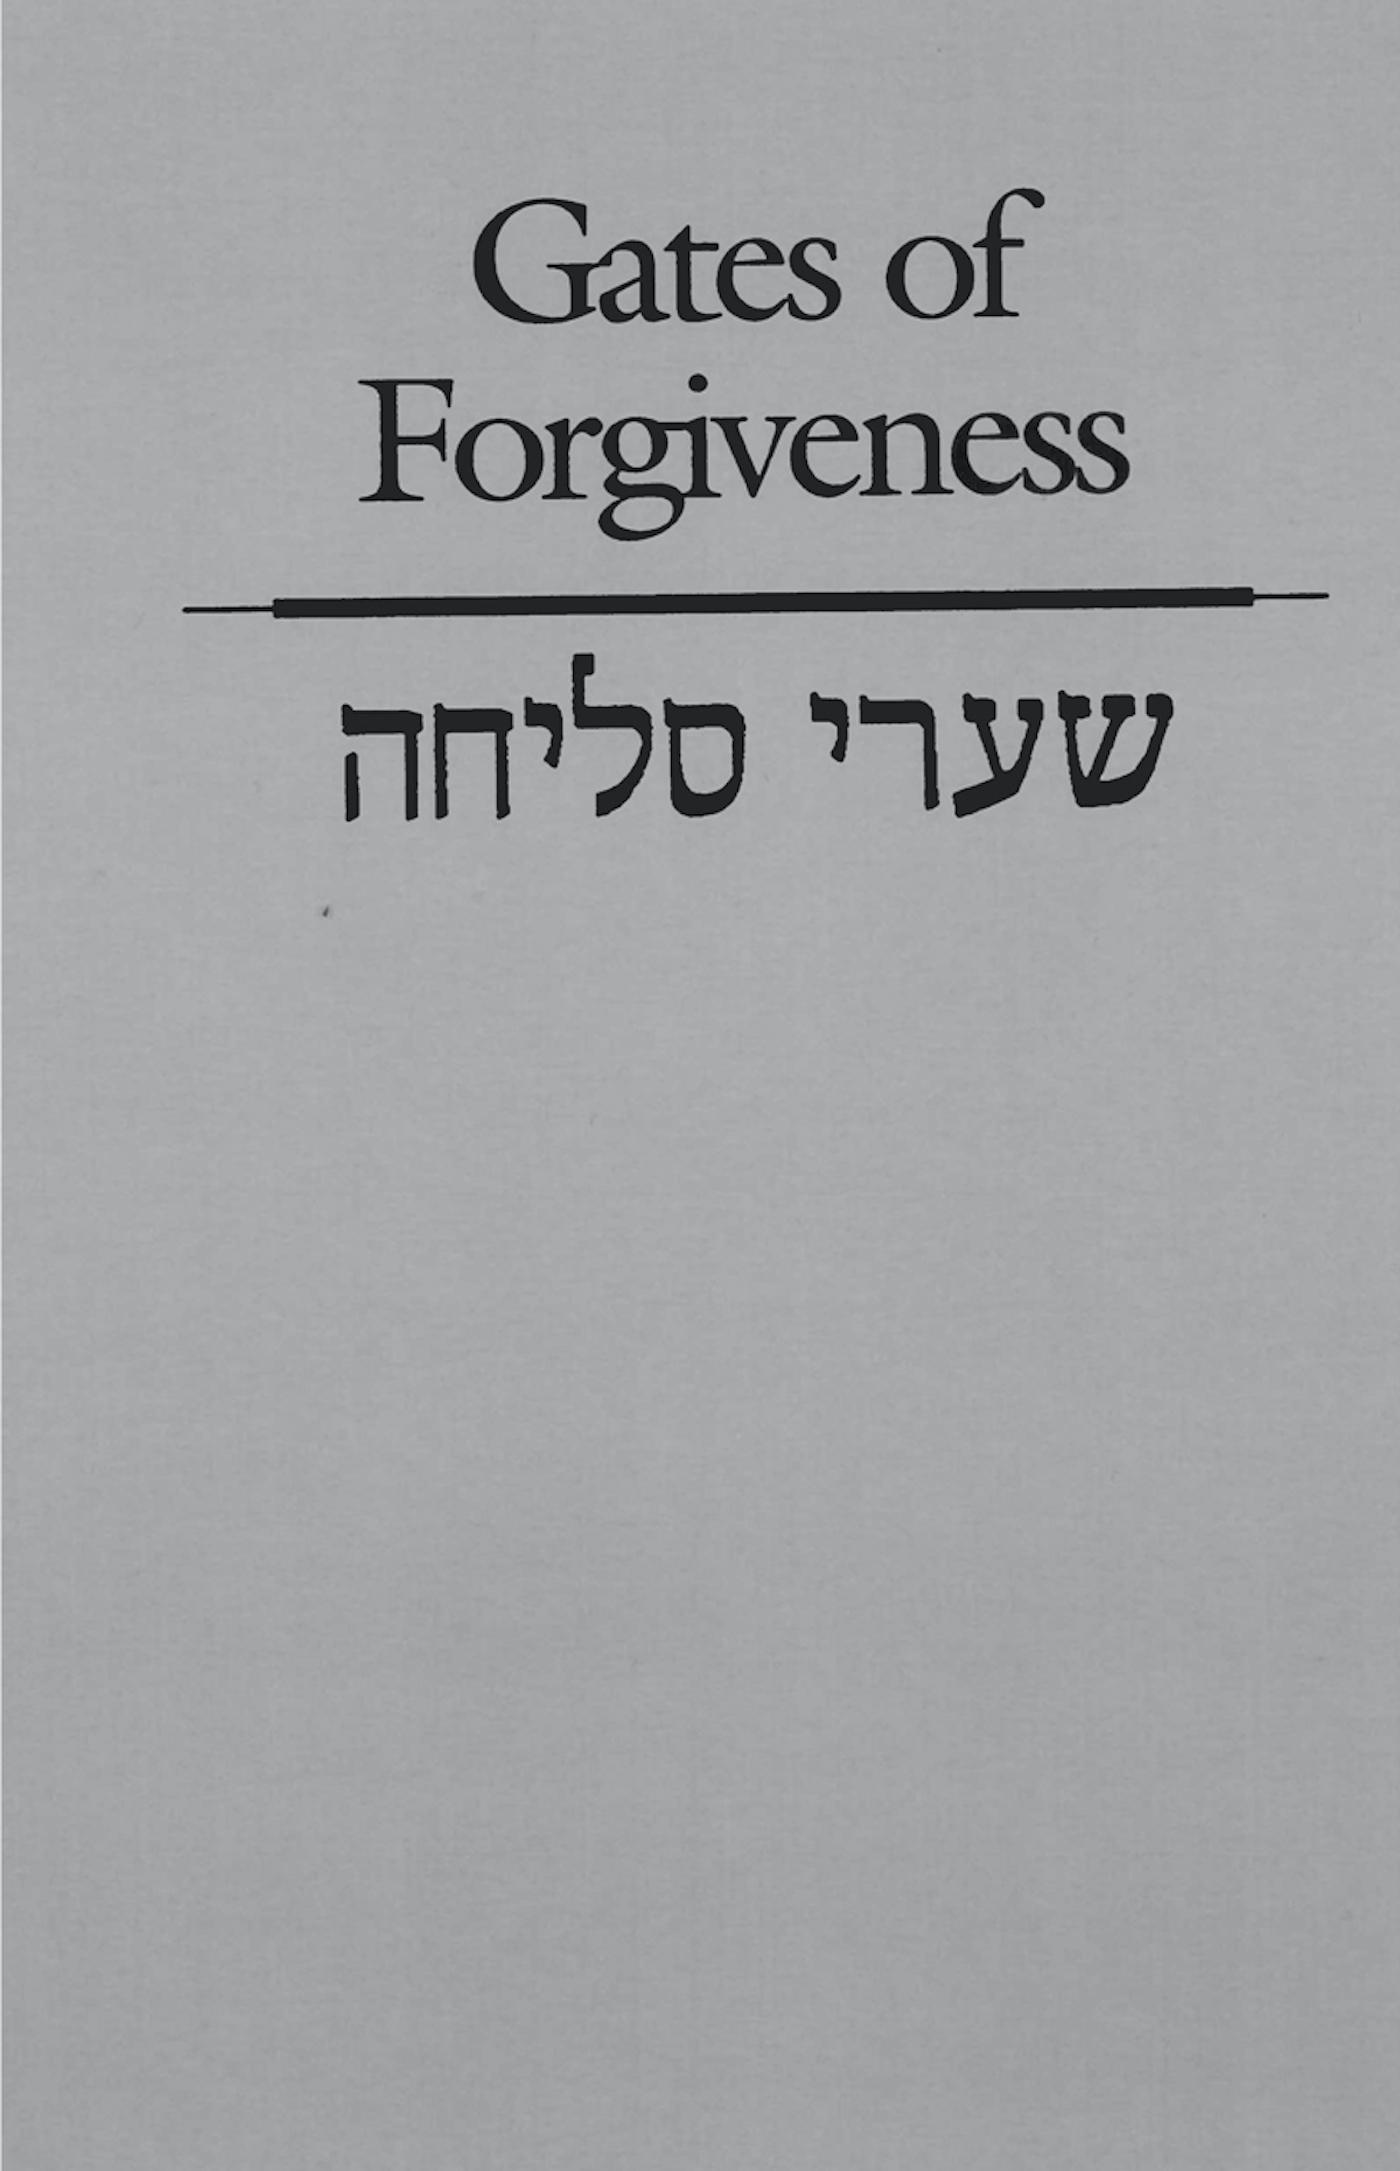 Gates of Forgiveness